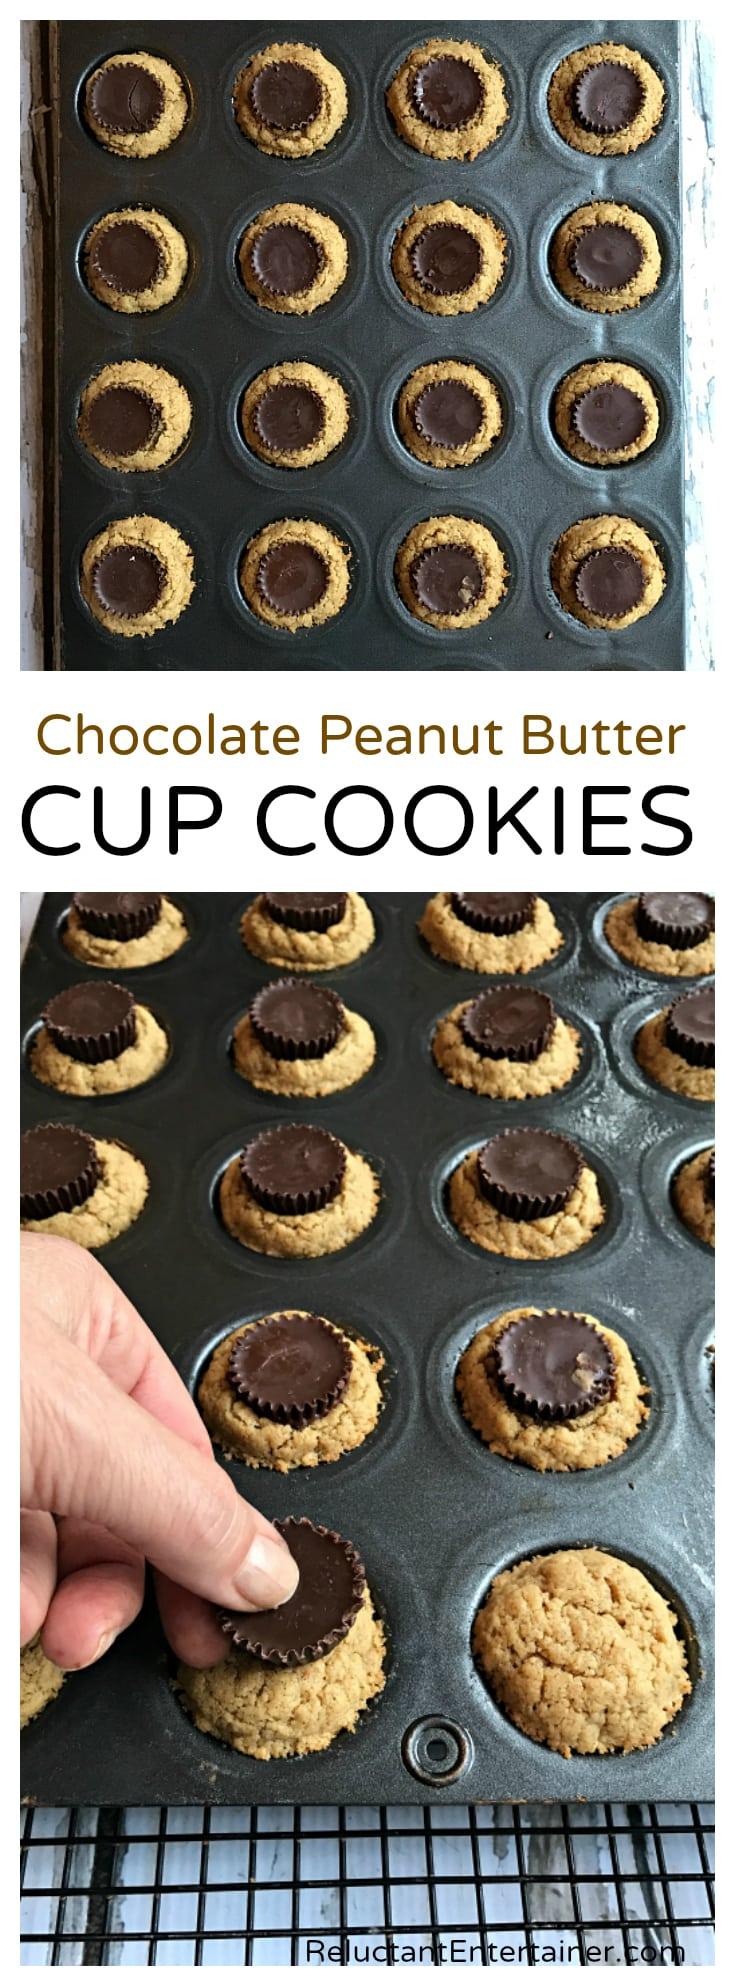 Chocolate Peanut Butter Cup Cookies Recipe